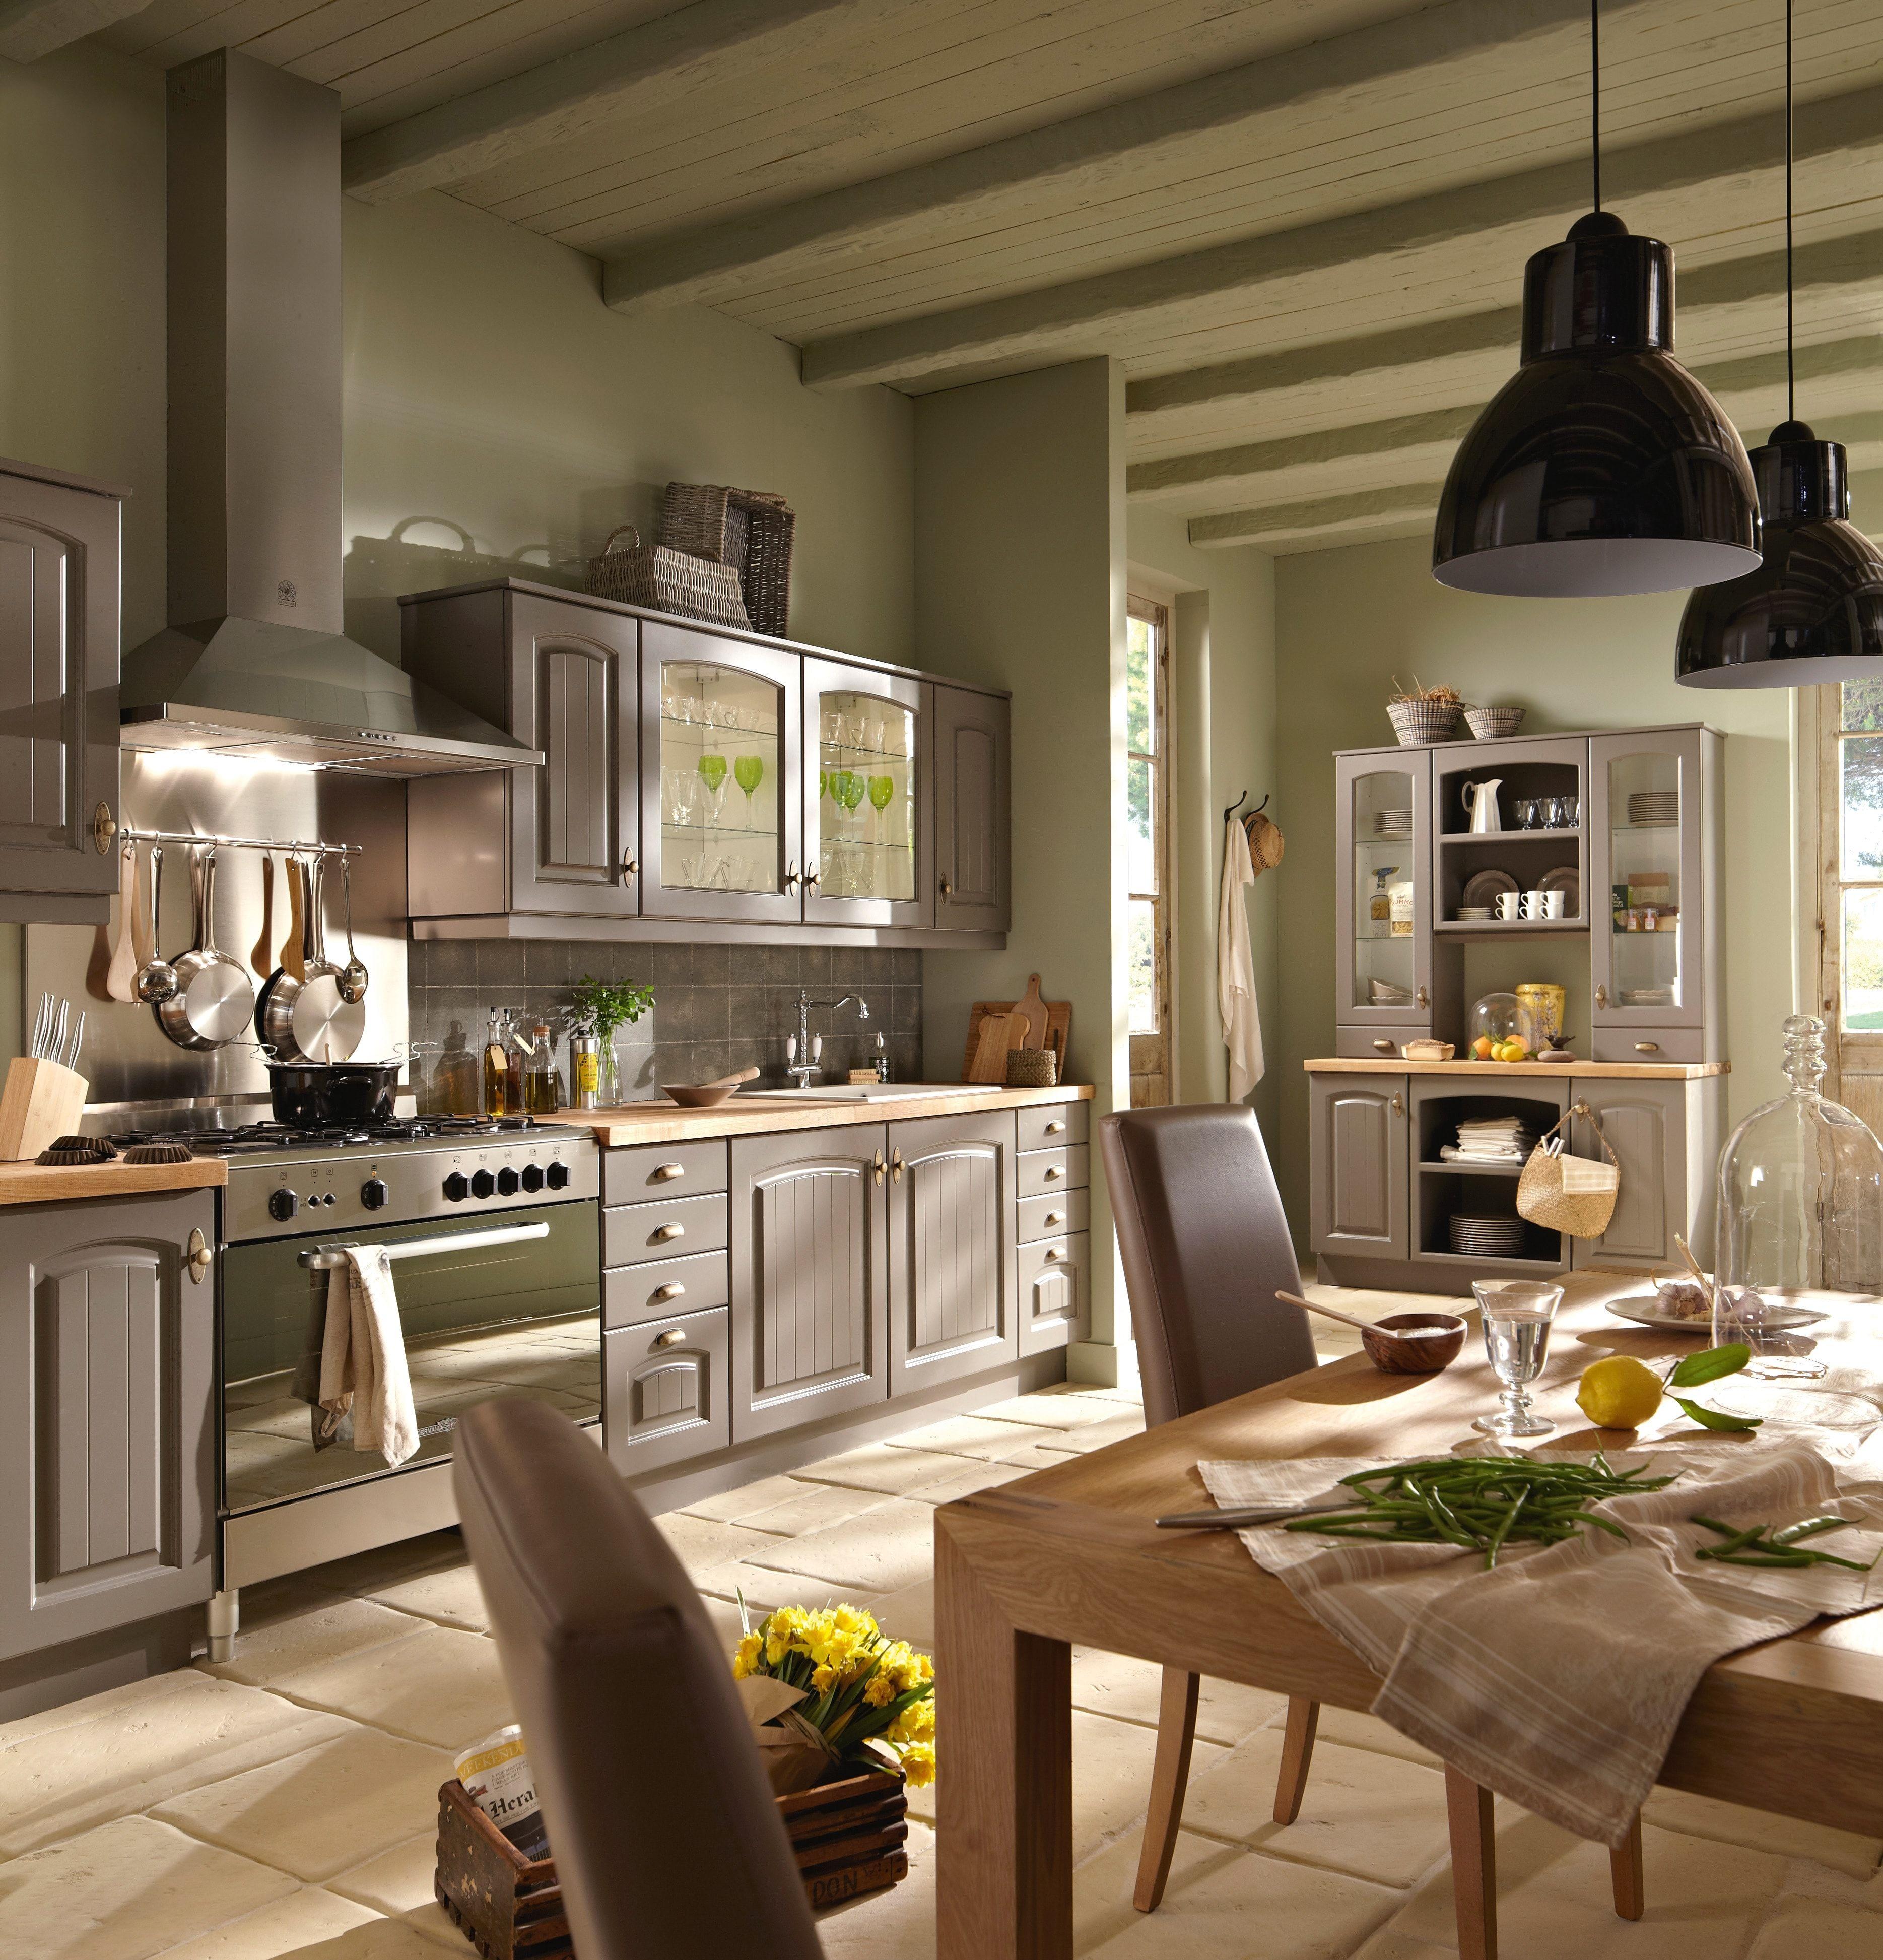 Meuble cuisine oslo conforama id e pour cuisine - Meuble conforama cuisine ...